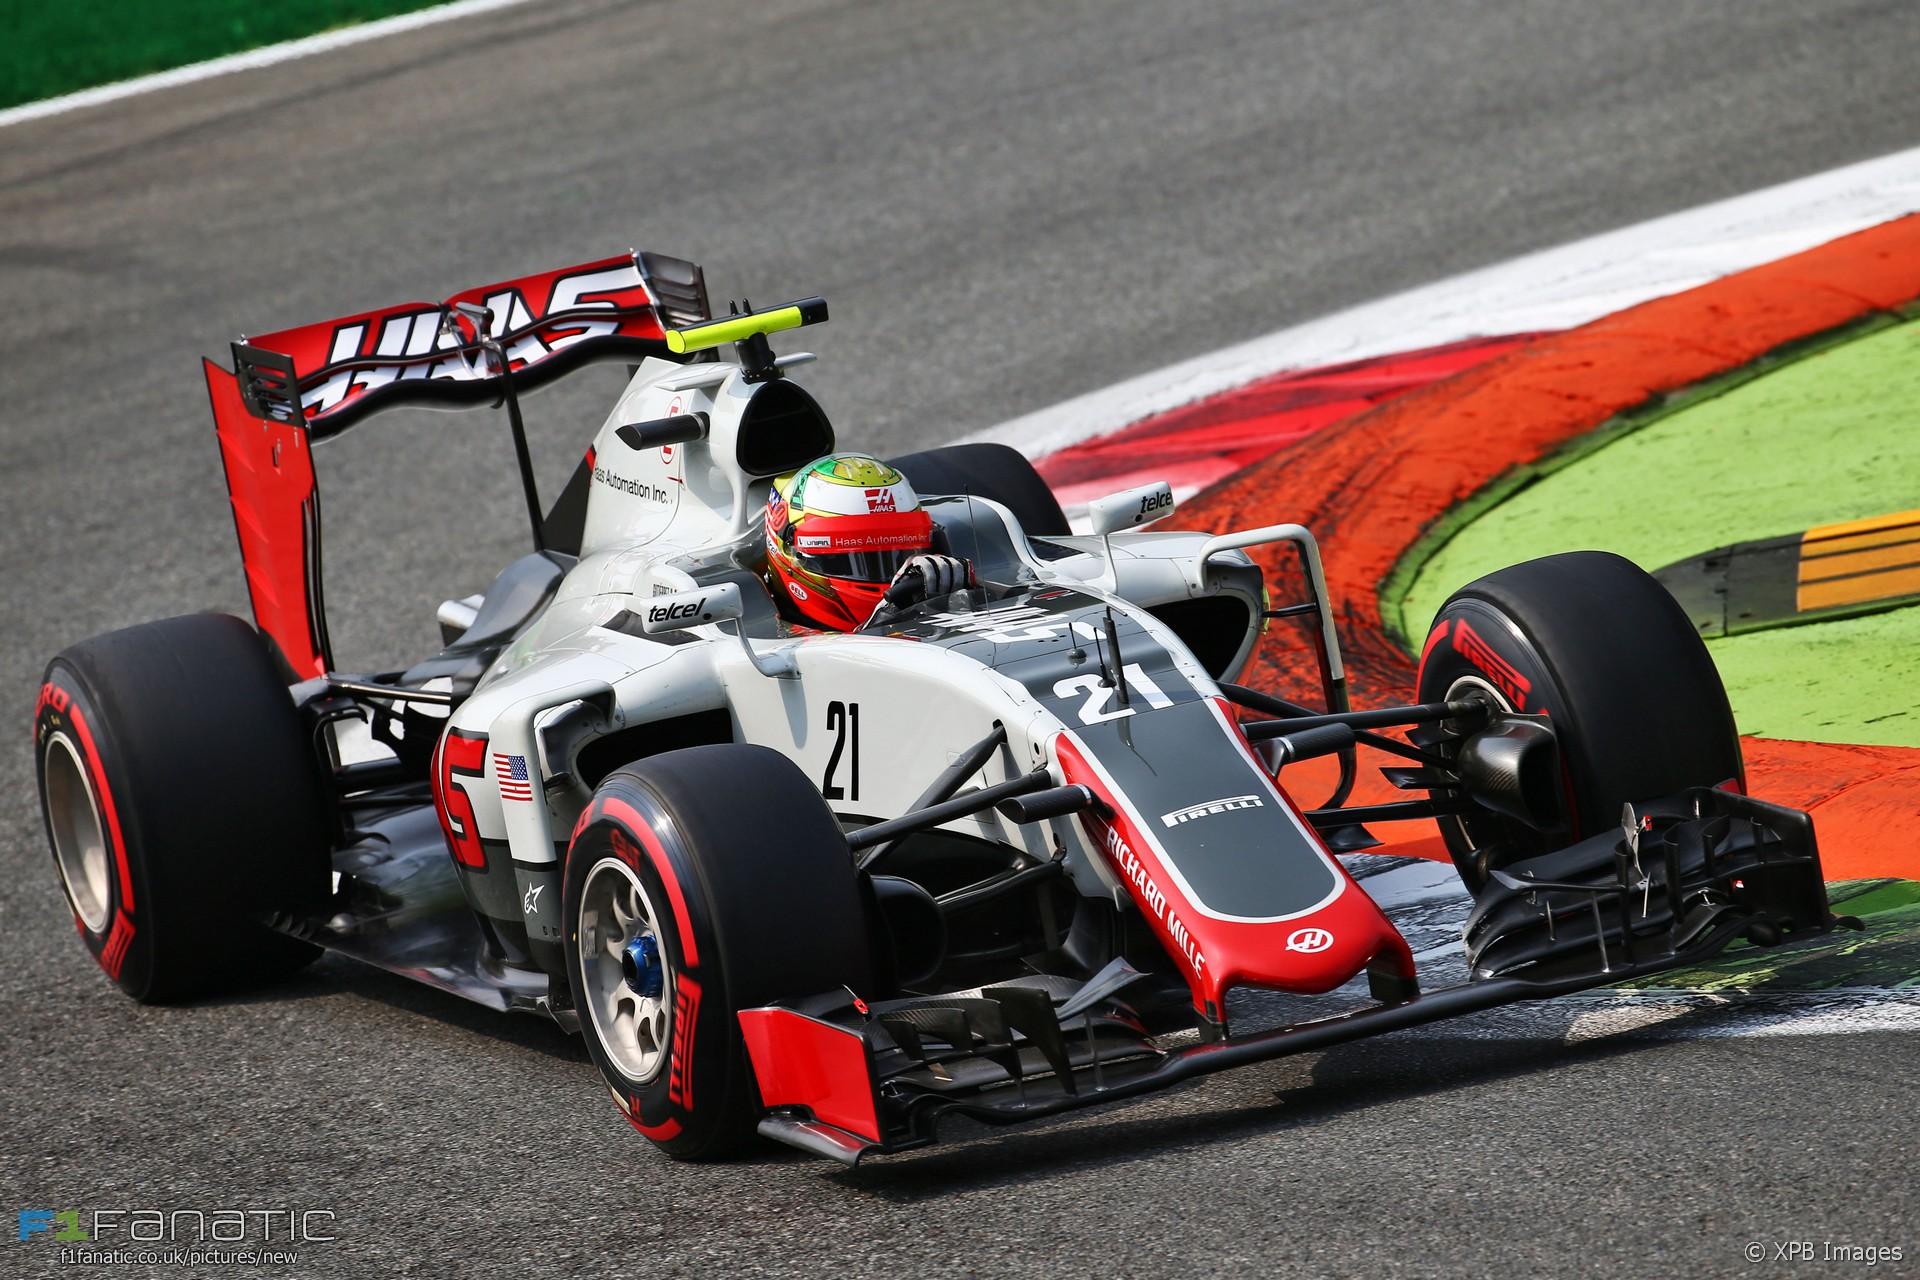 Esteban Gutierrez, Haas, Monza, 2016